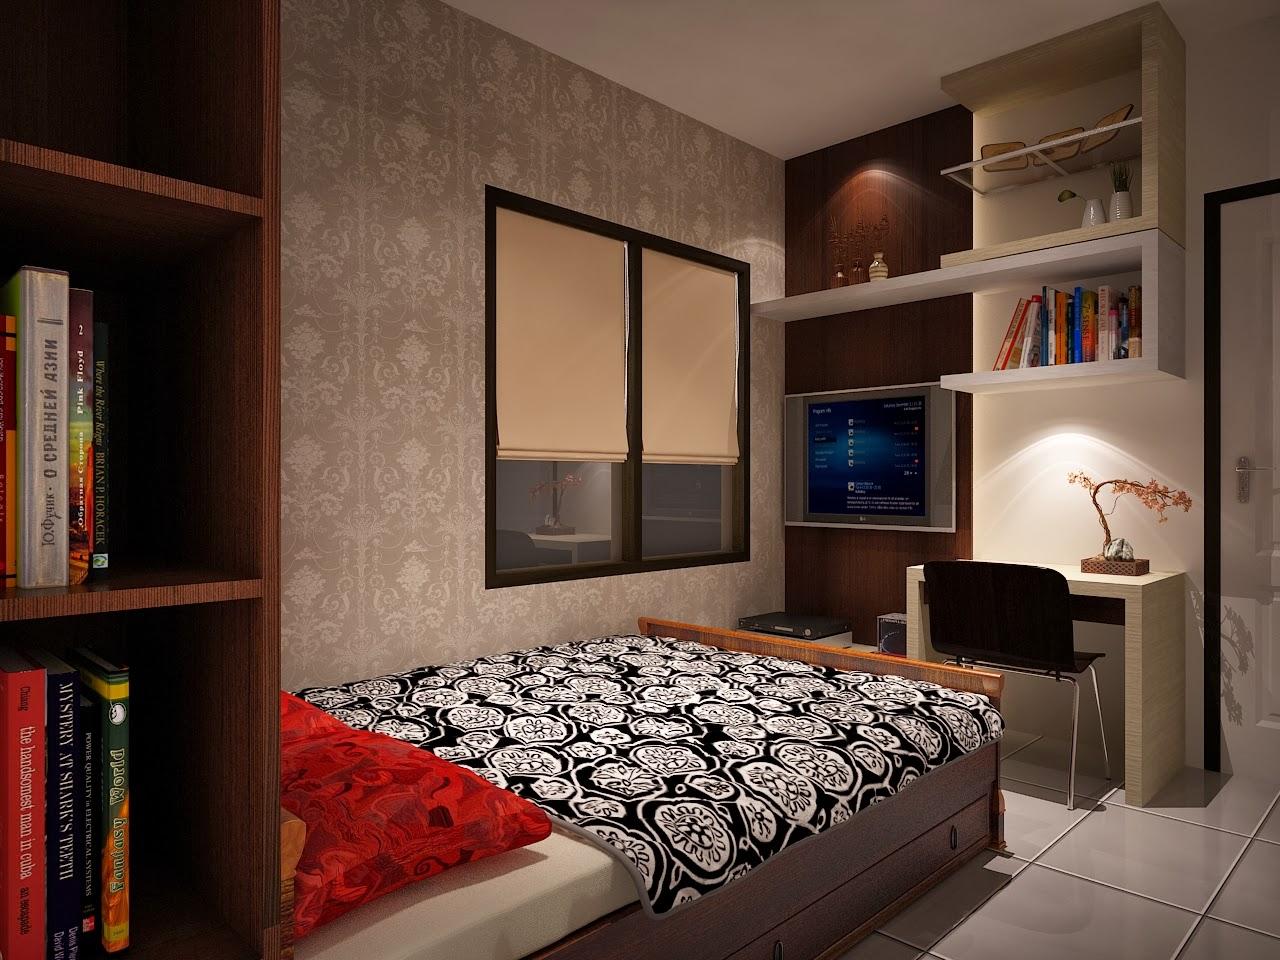 Desain interior apartemen silkwood residence 2 bedroom for Design interior apartemen 1 bedroom